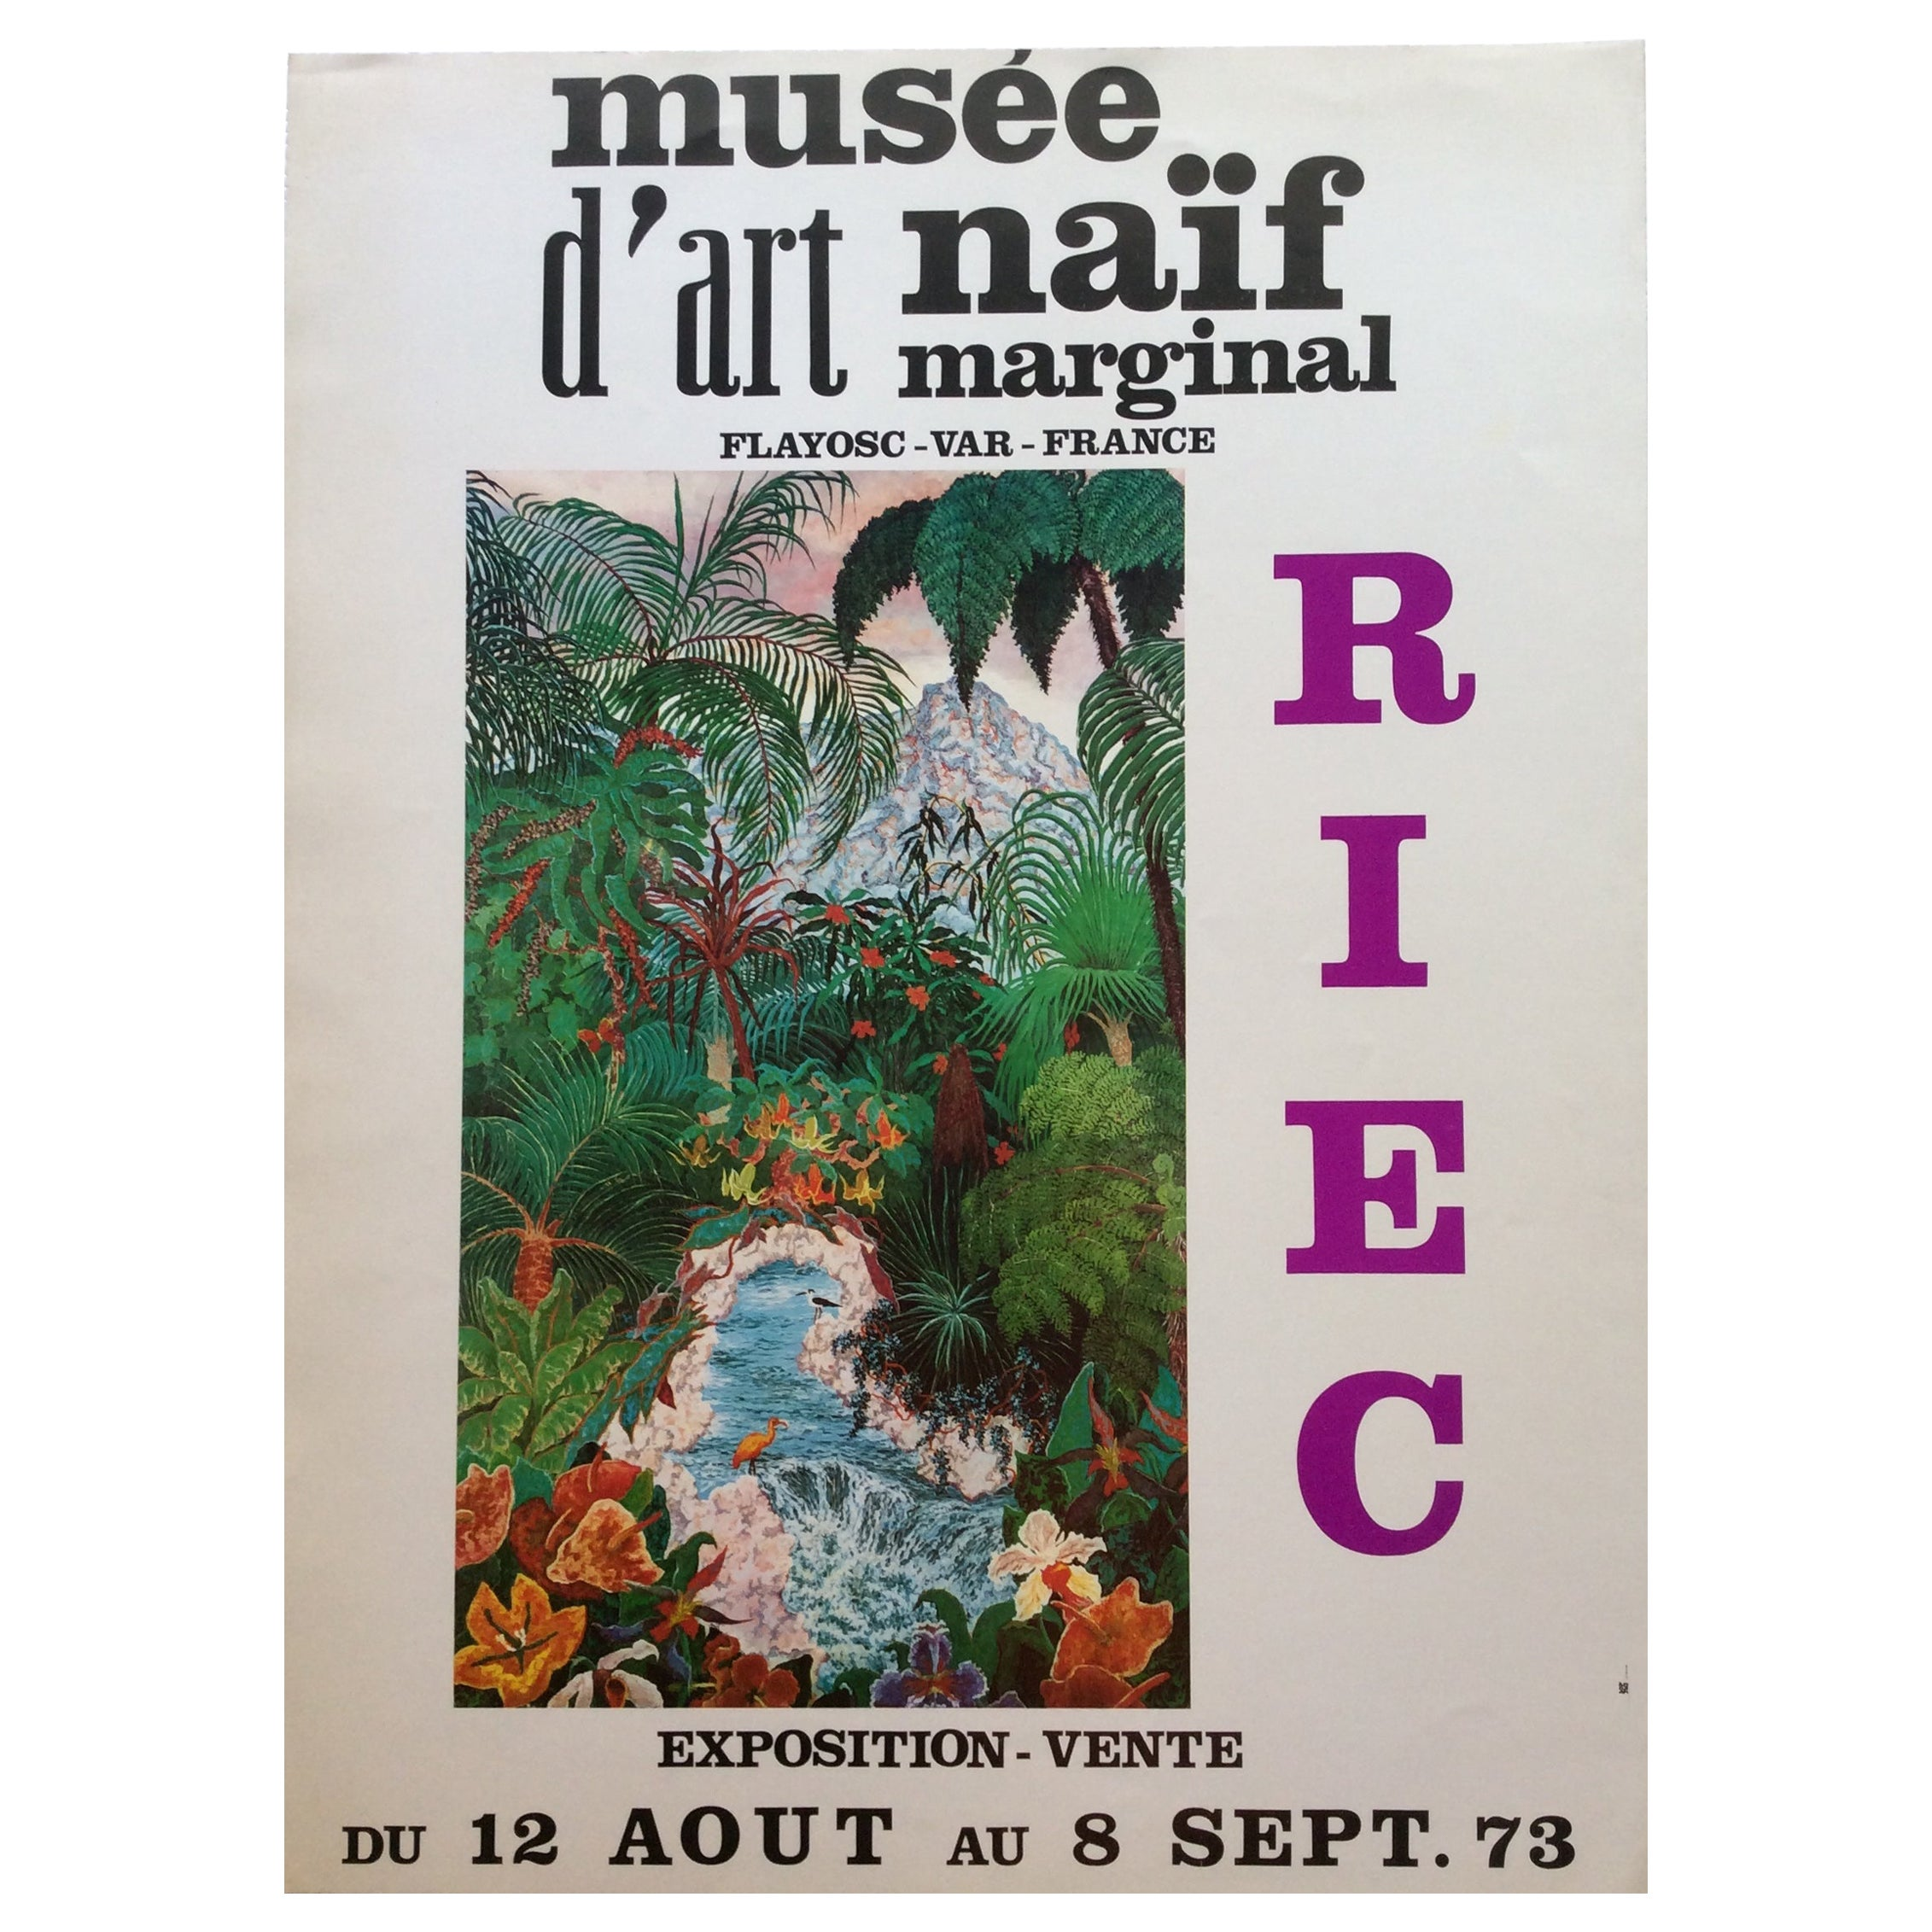 Nature Depicted 1970s Vintage Riec Art Exhibition Poster